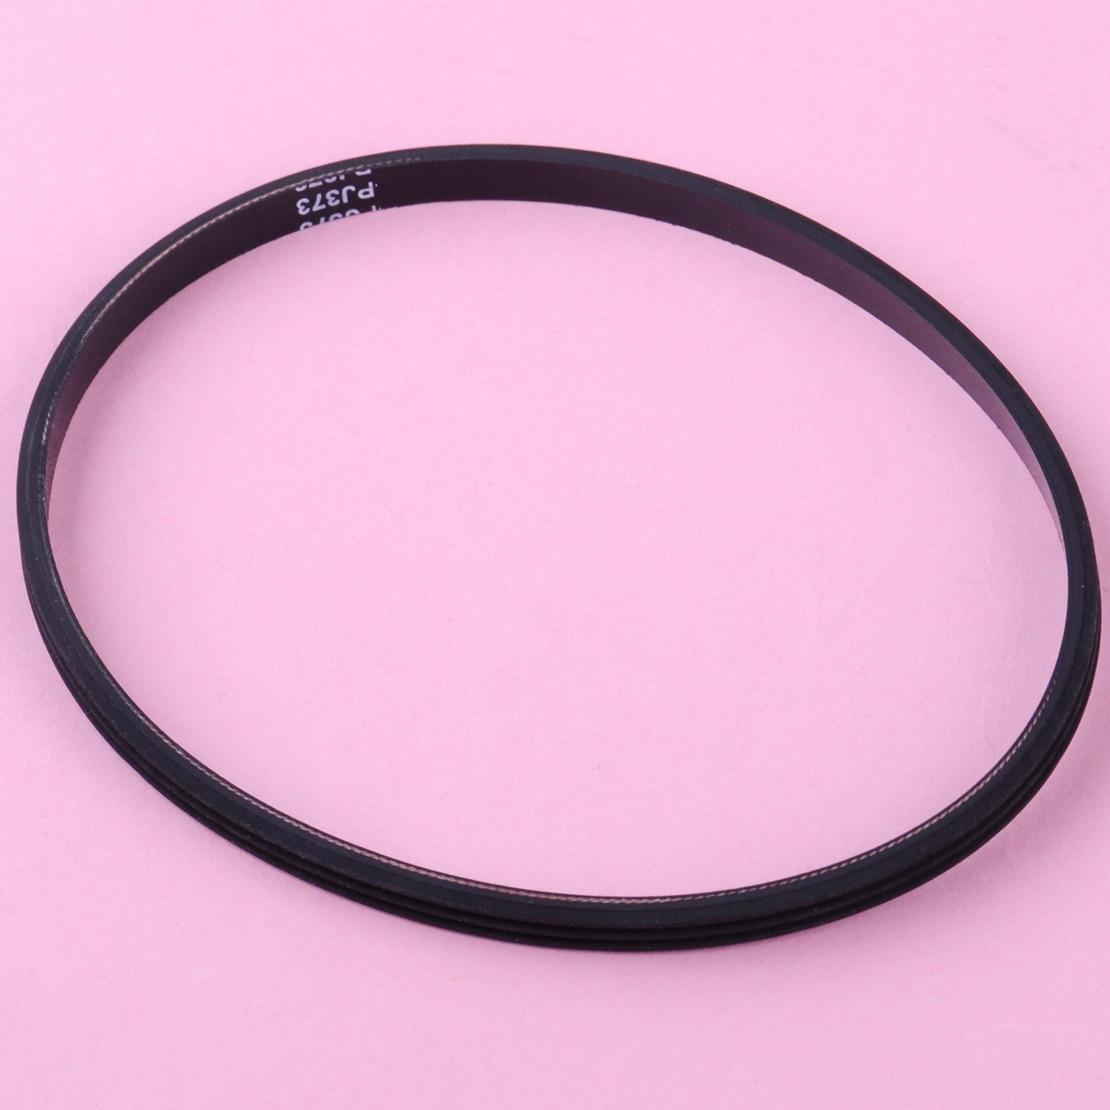 Replacement Belt for Husky Air Compressors PJ373 Fits H1504ST A700062 Pumps